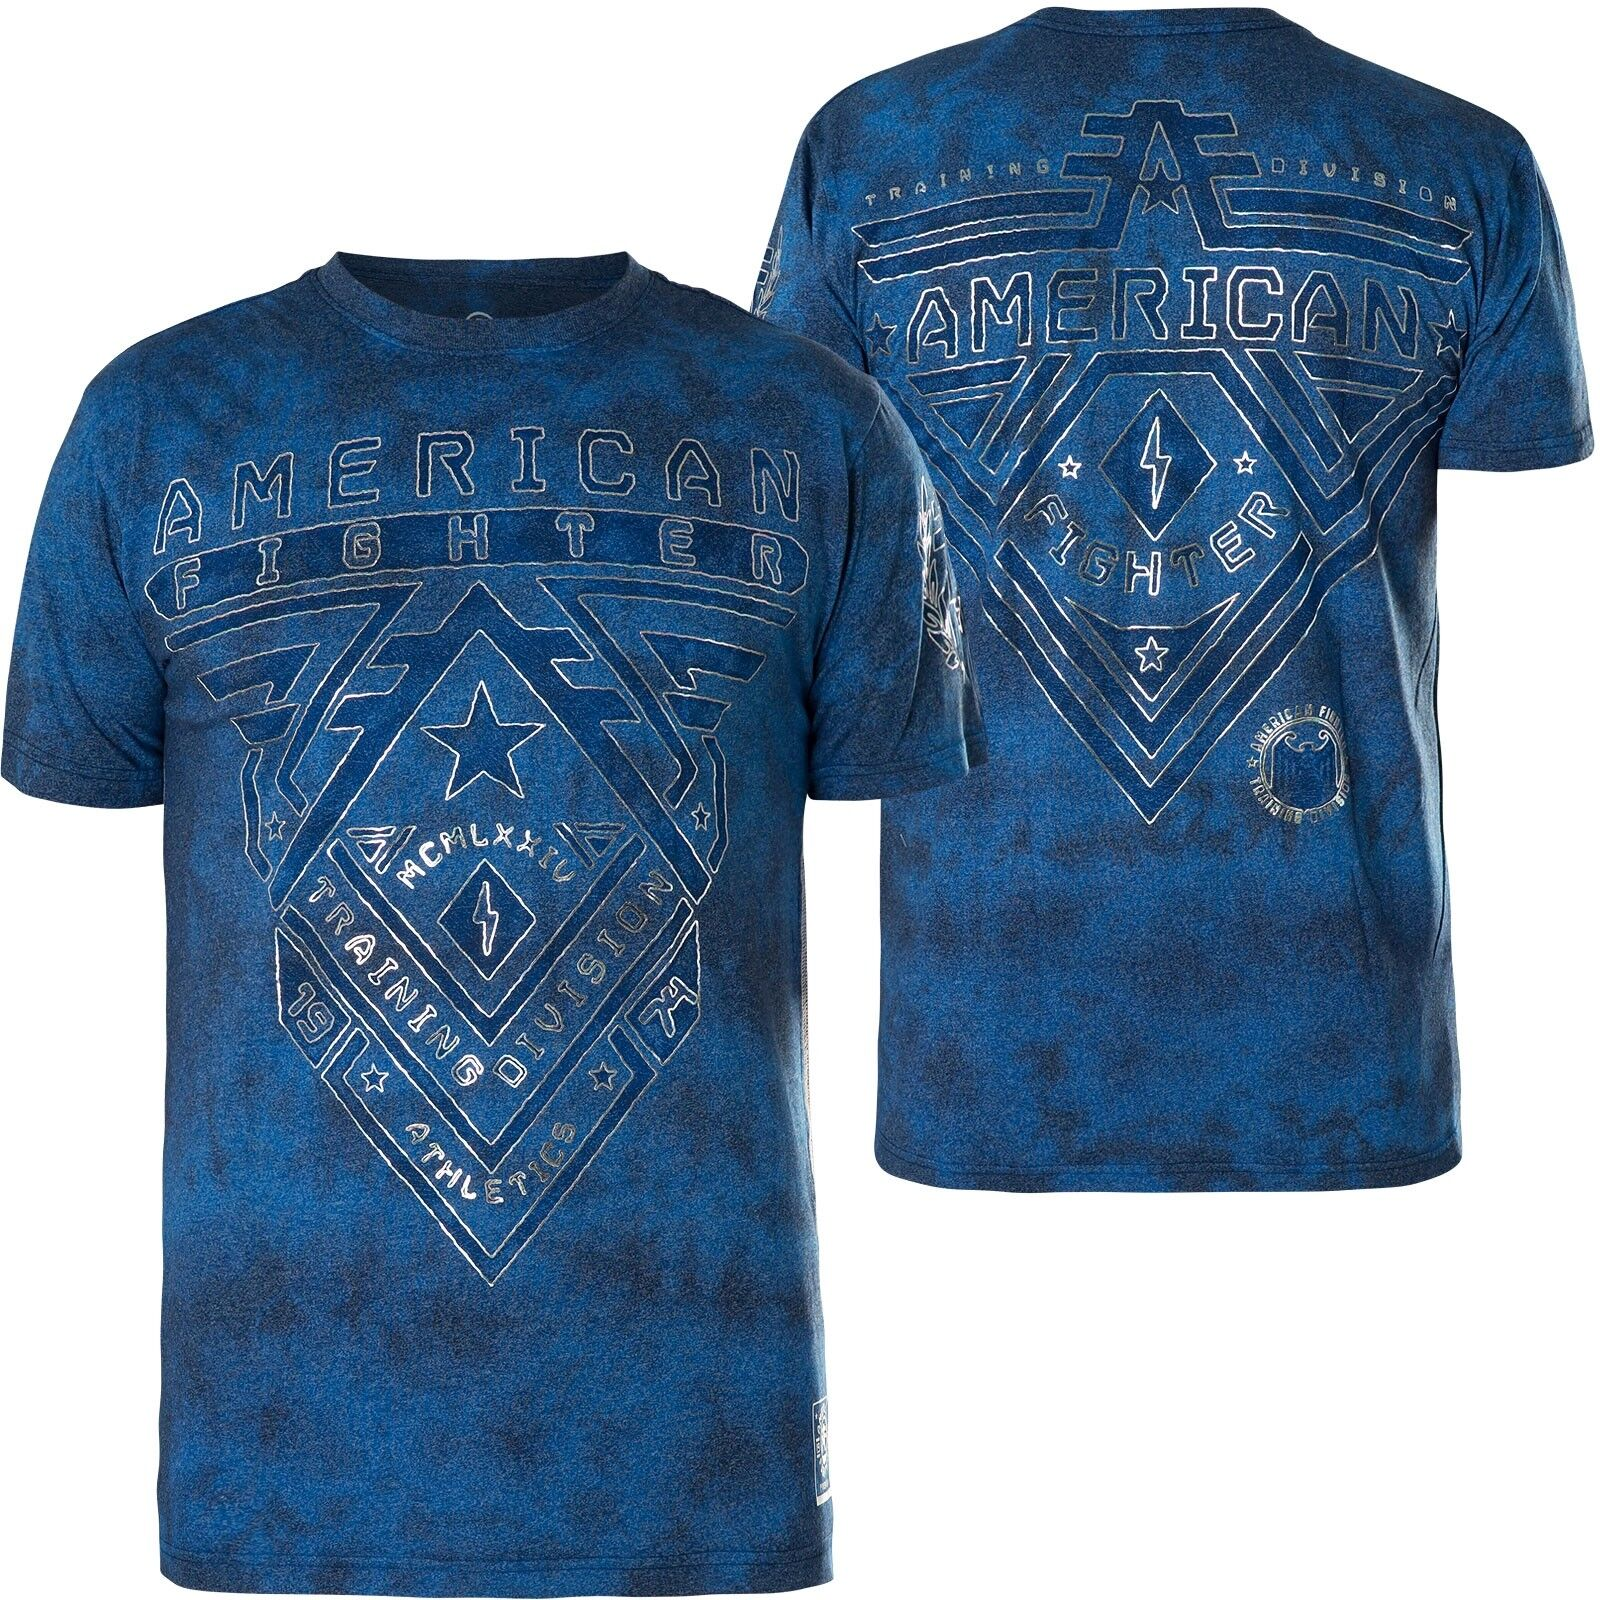 American Fighter Affliction T-shirt Crossroads ARTISAN BLU T-shirts